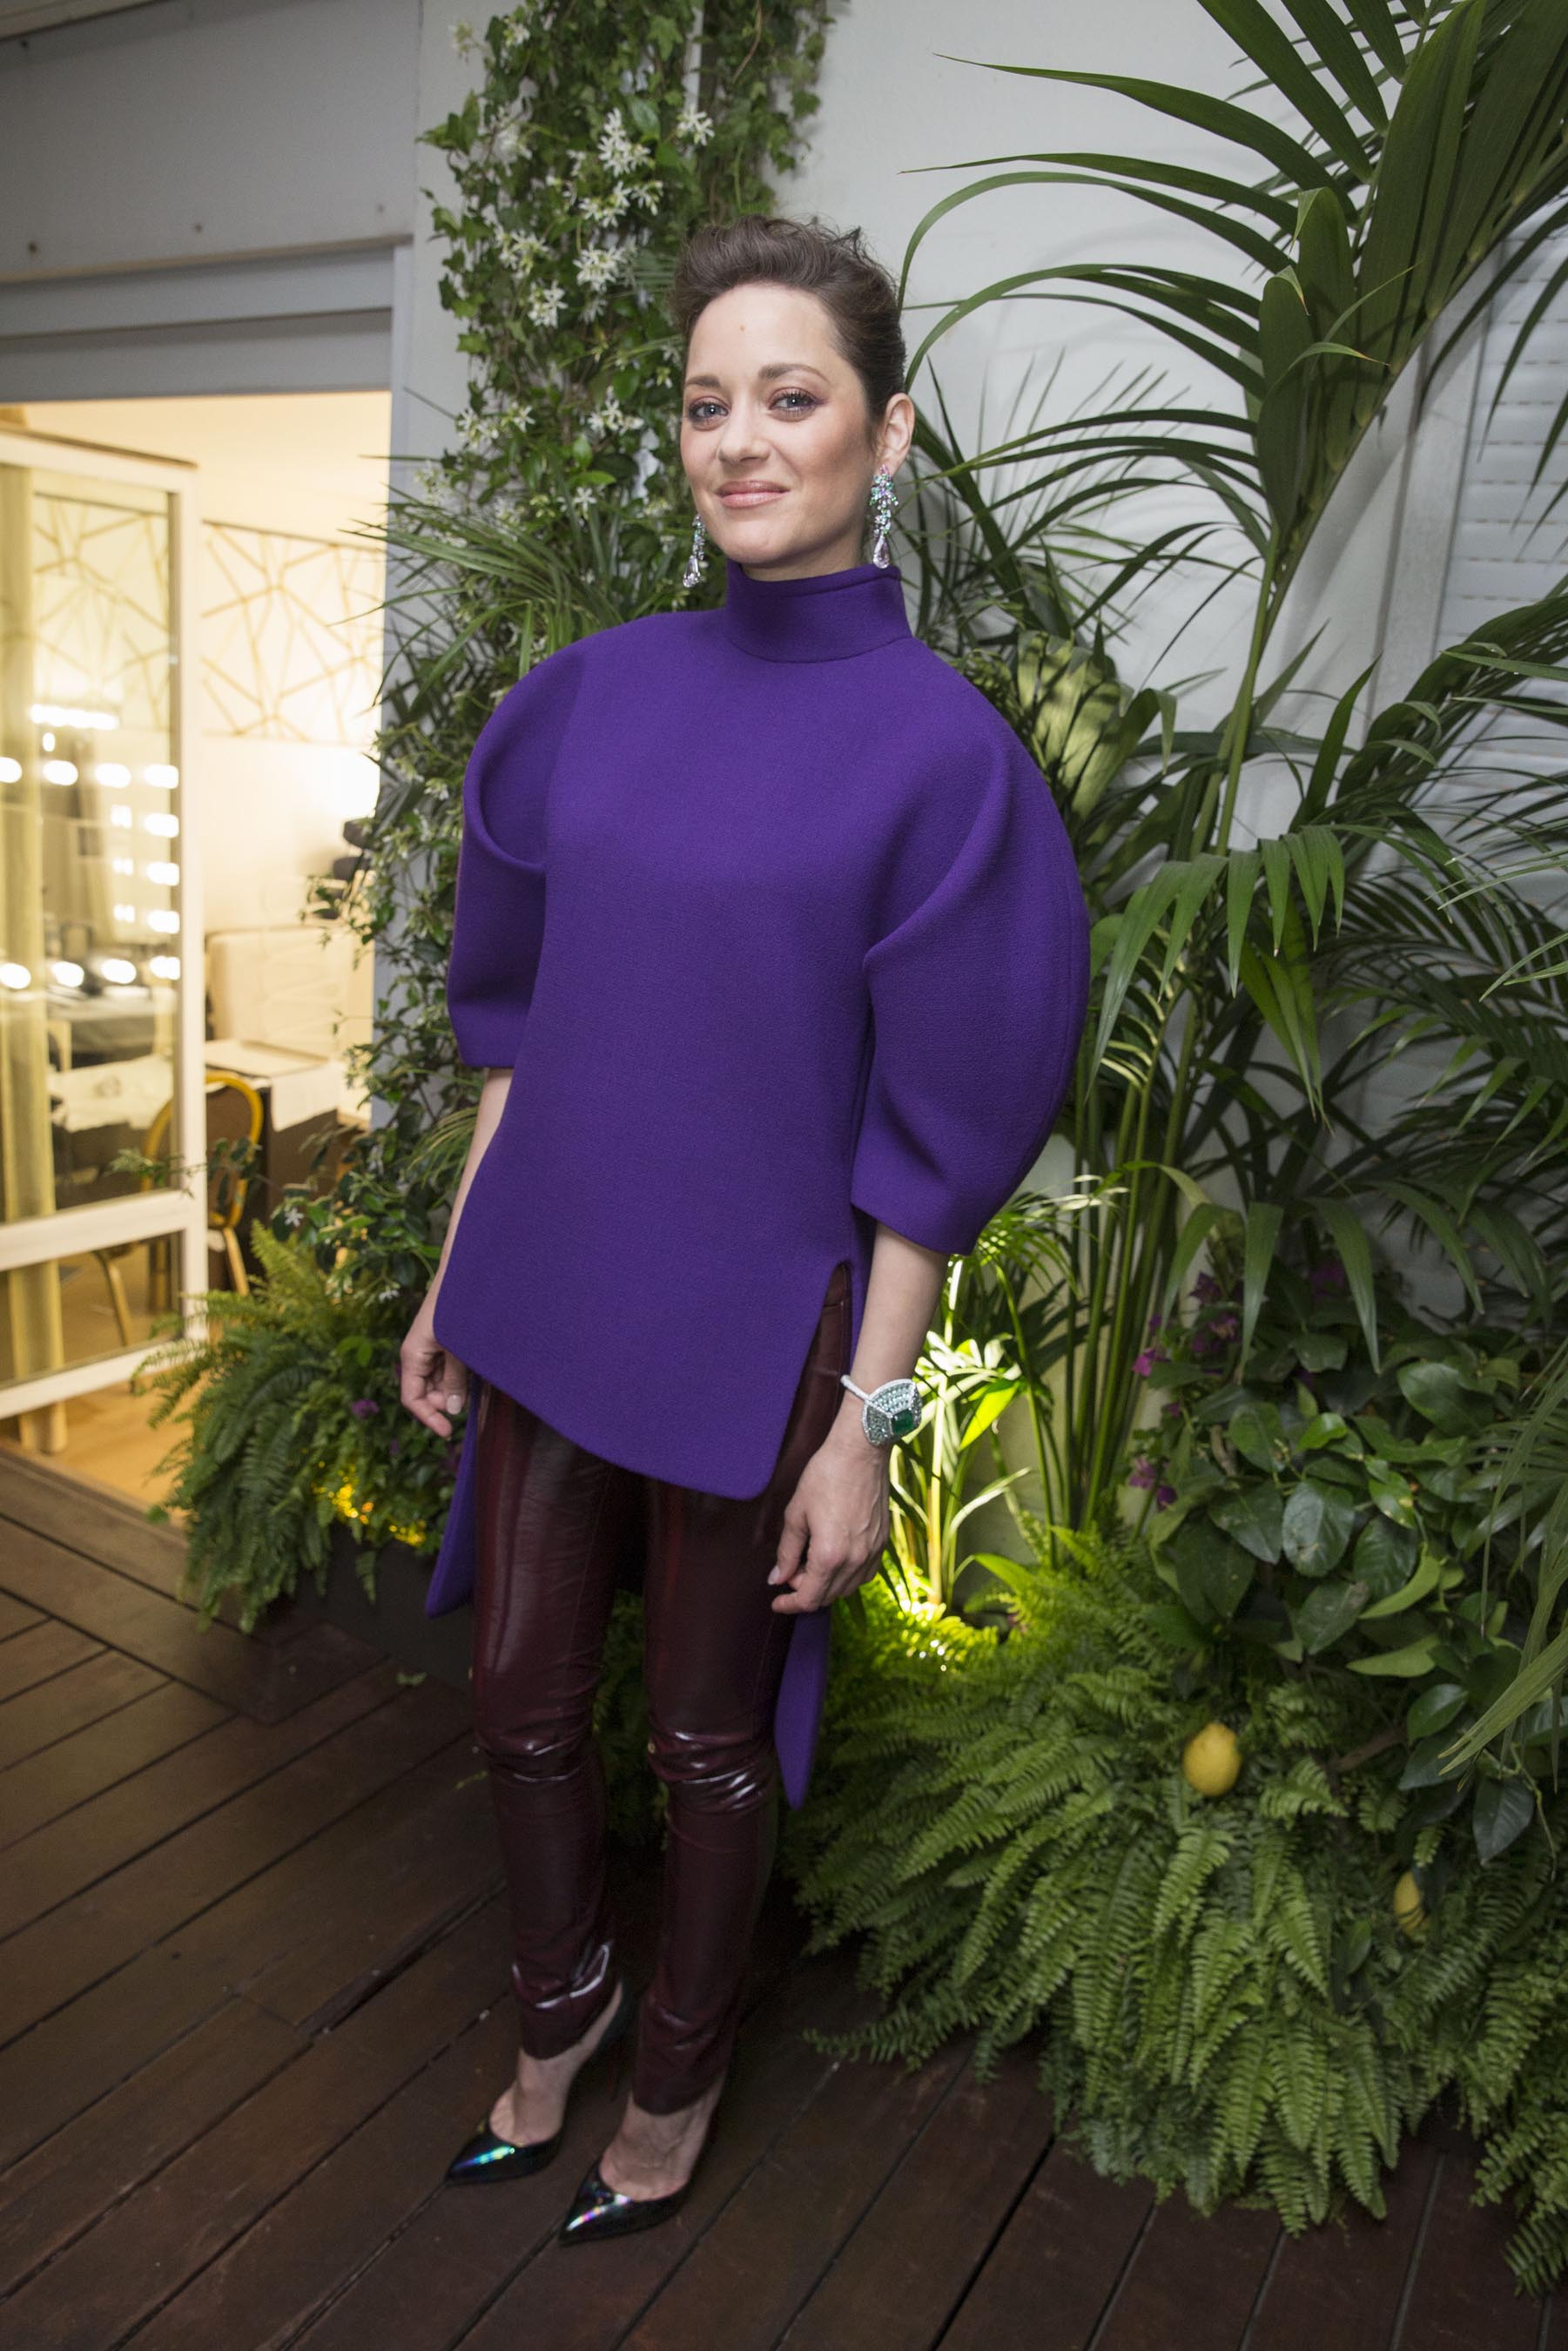 Marion Cotillard attends Cannes Film Festival Marion Cotillard